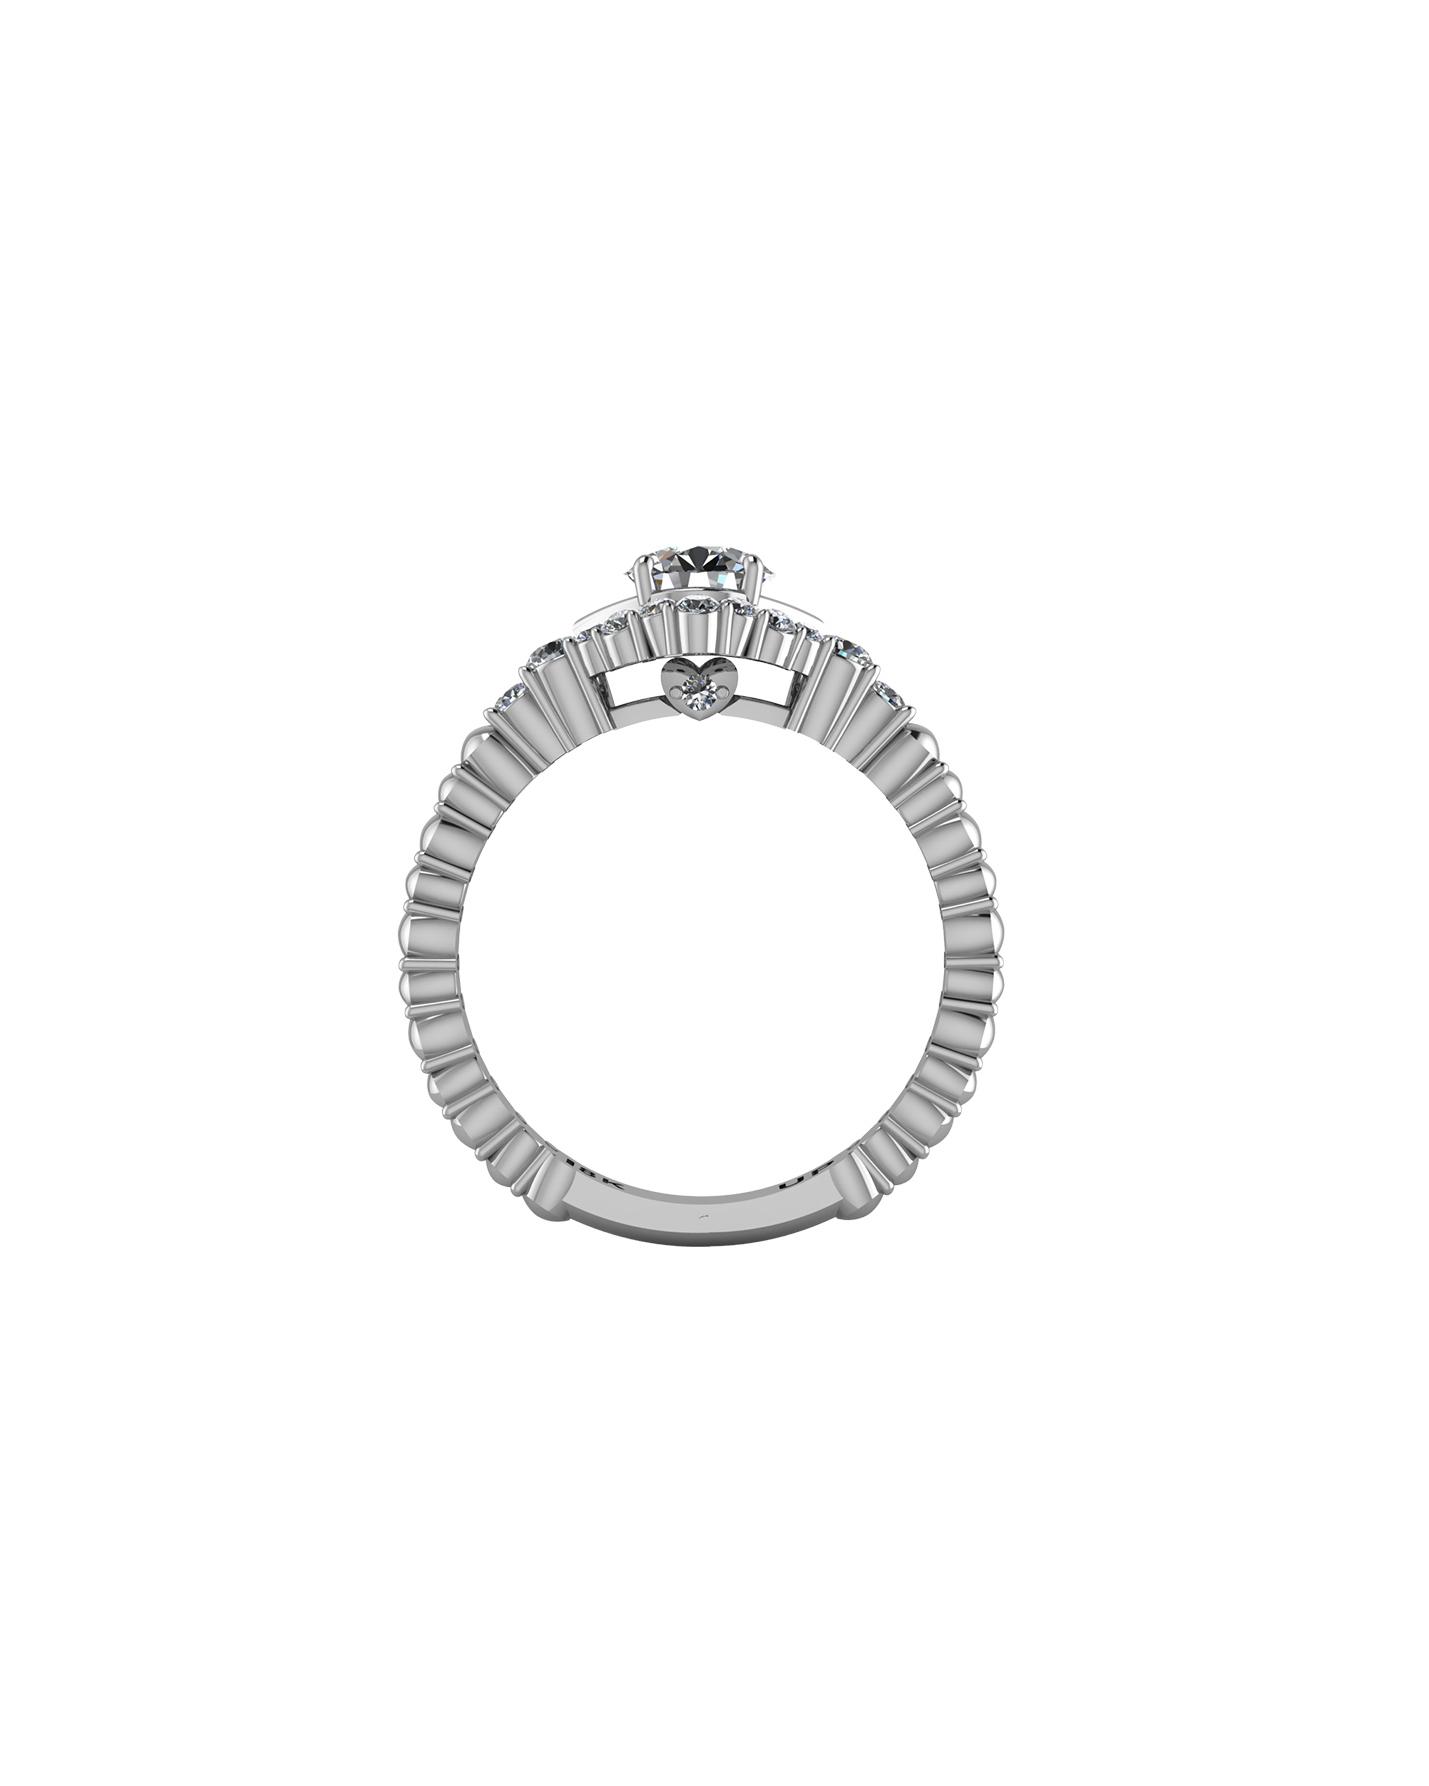 designer diamond bridal jewelry--2.jpg